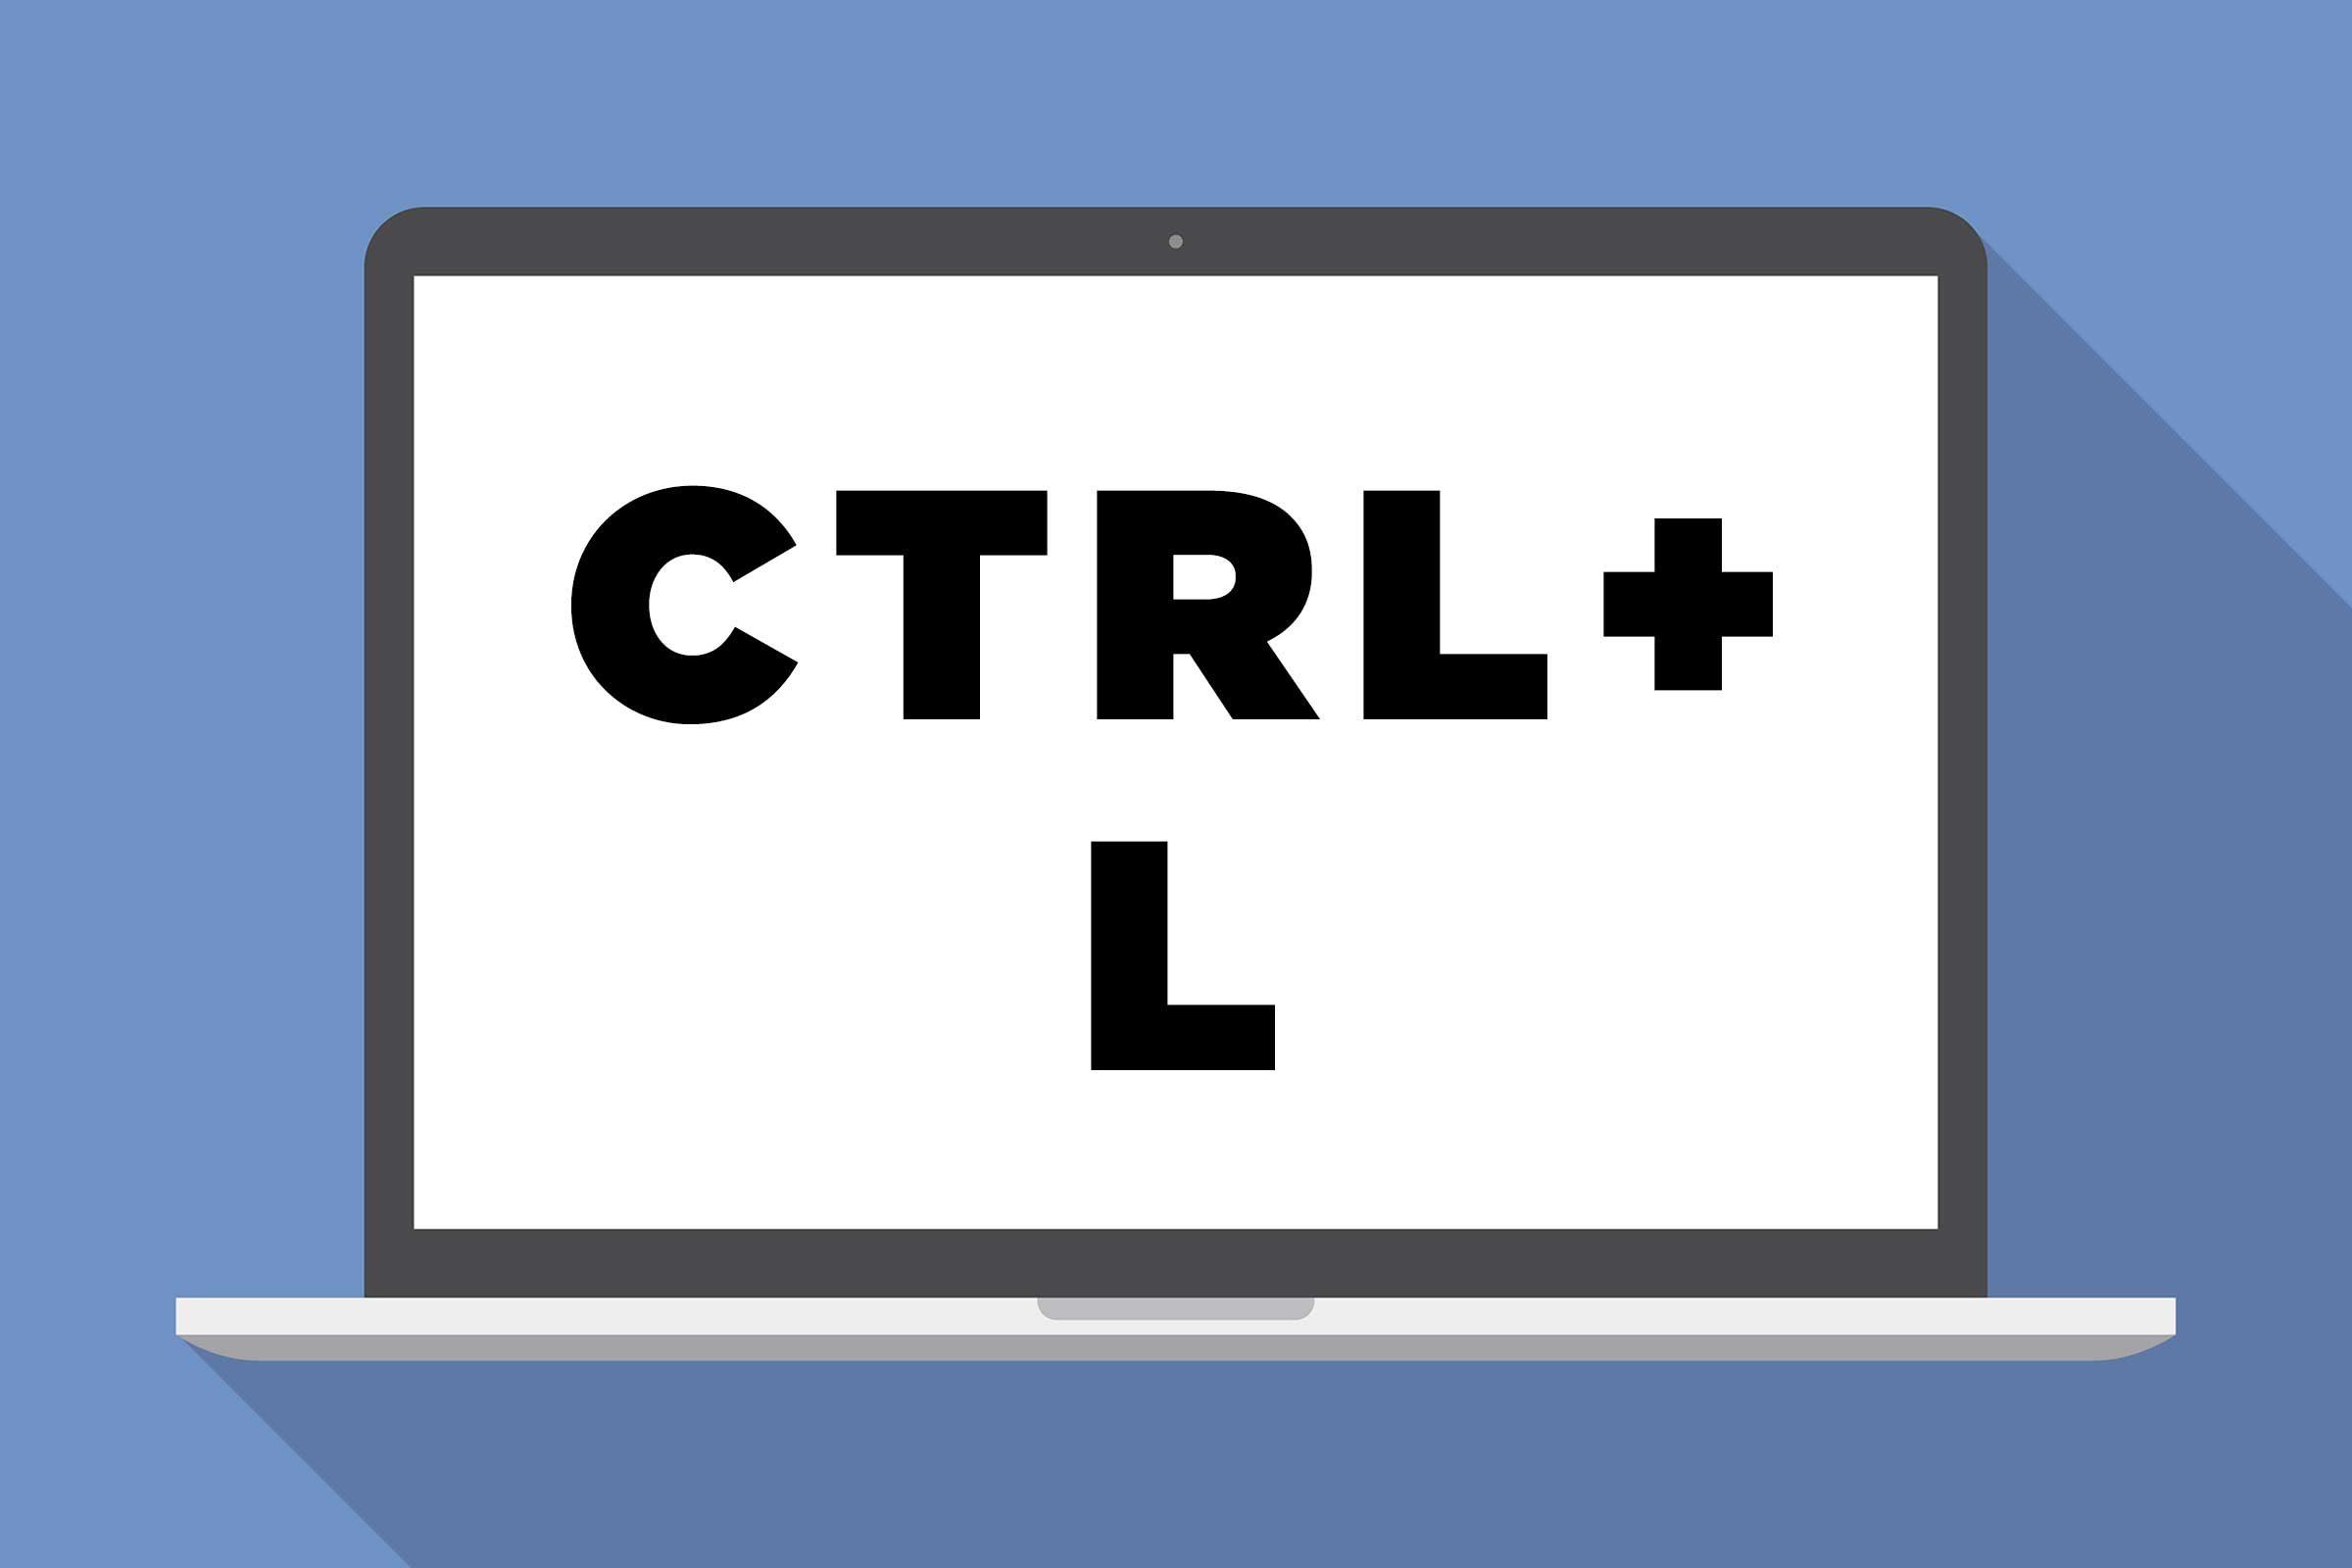 CTRL + L: Move the cursor to the URL bar